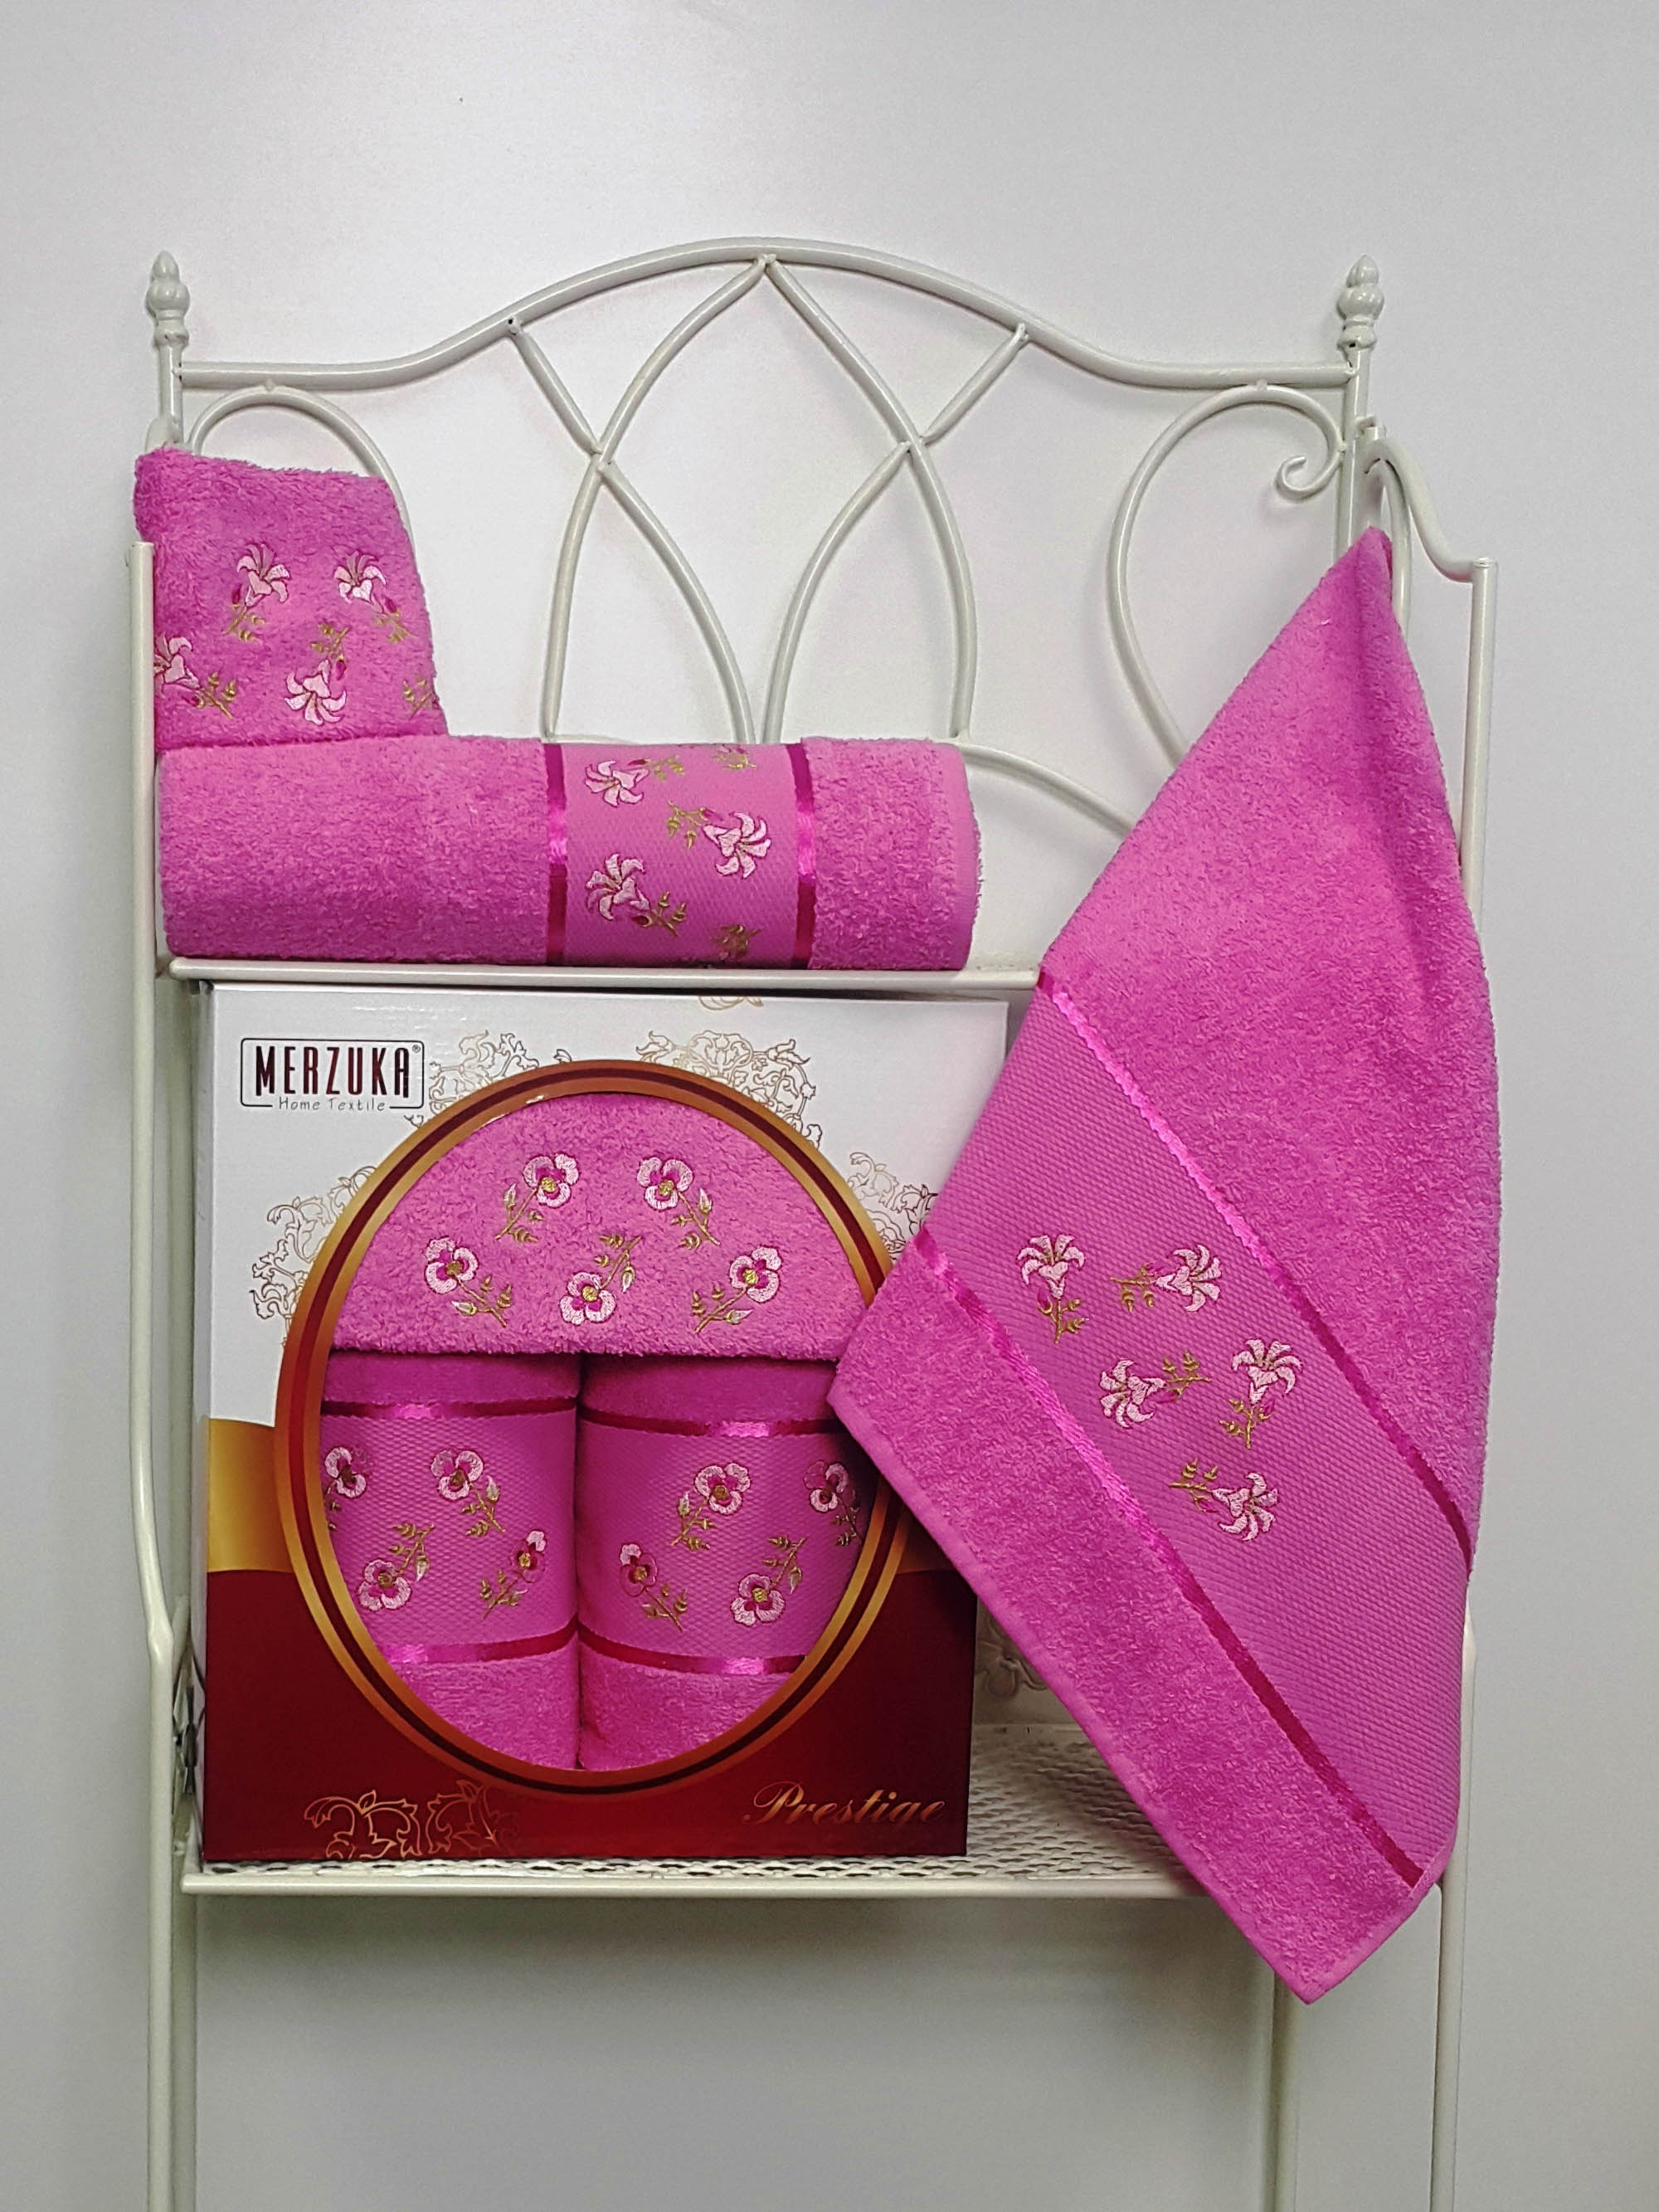 Полотенца Oran Merzuka Набор из 3 полотенец Prestij Цвет: Тёмно-Розовый набор из 3 полотенец merzuka sakura 50х90 2 70х140 8432 оранжевый